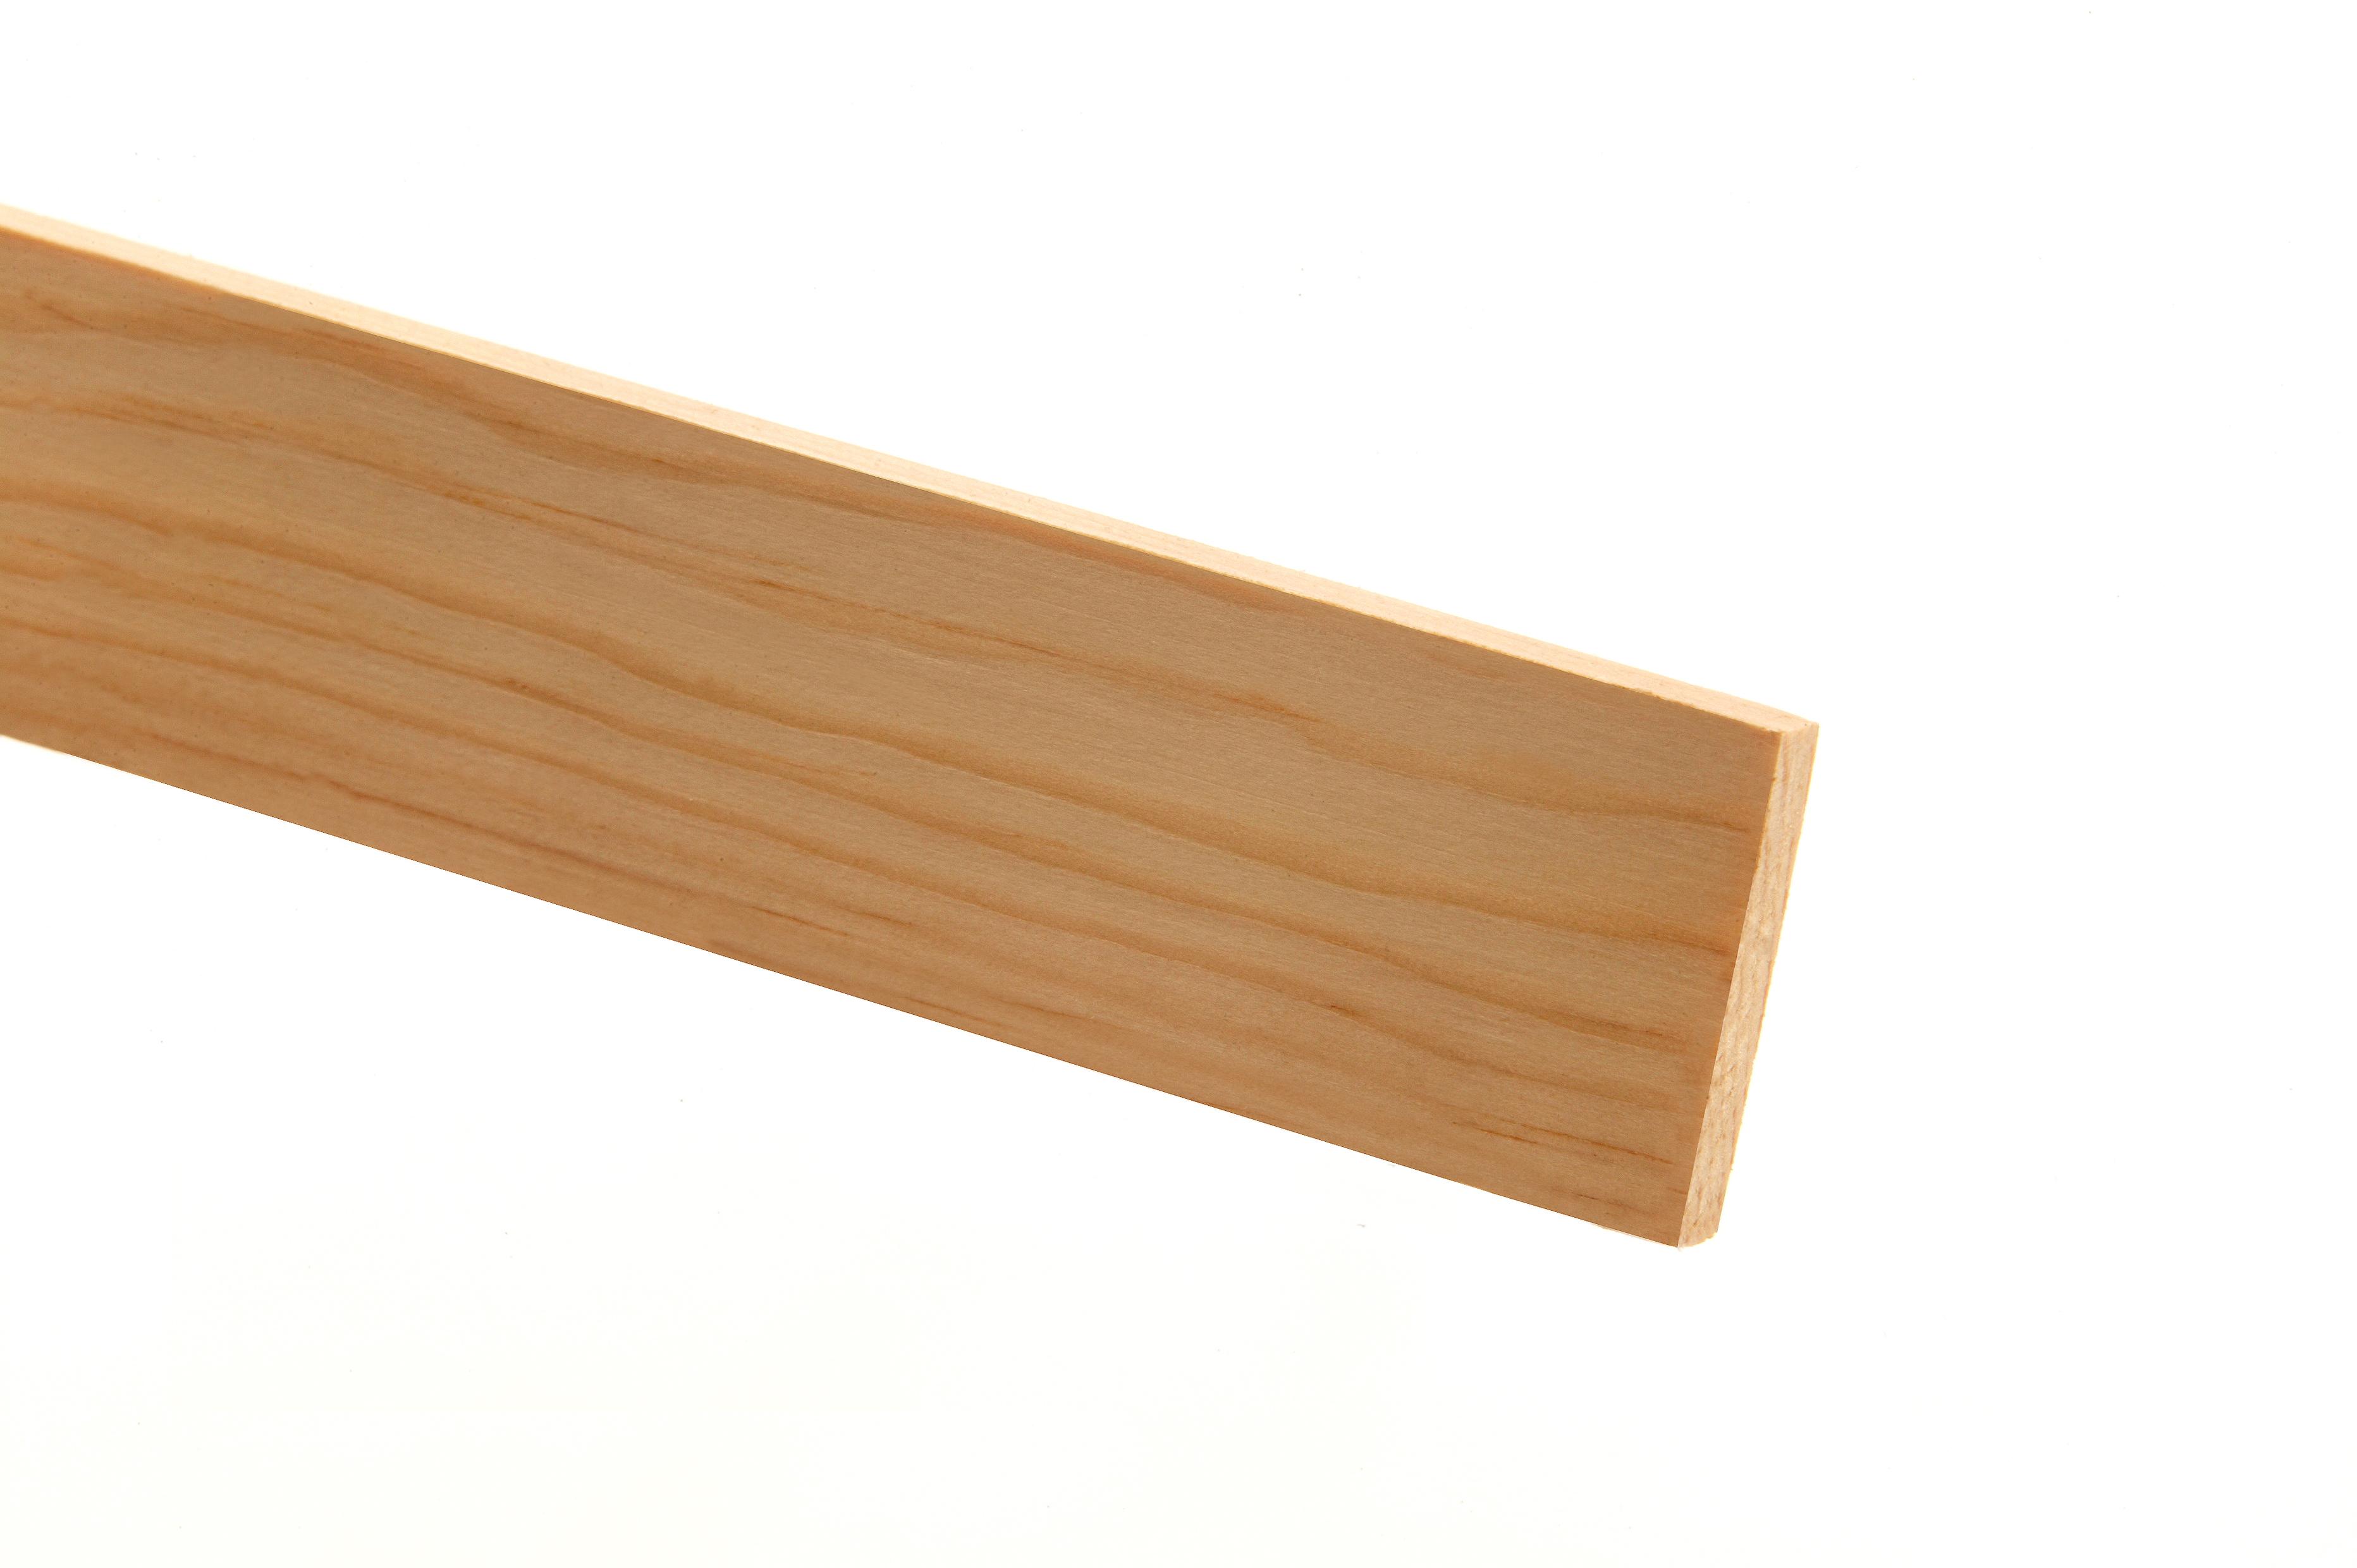 10 Pine PSE Stripwood 21 x 36 x 2400mm